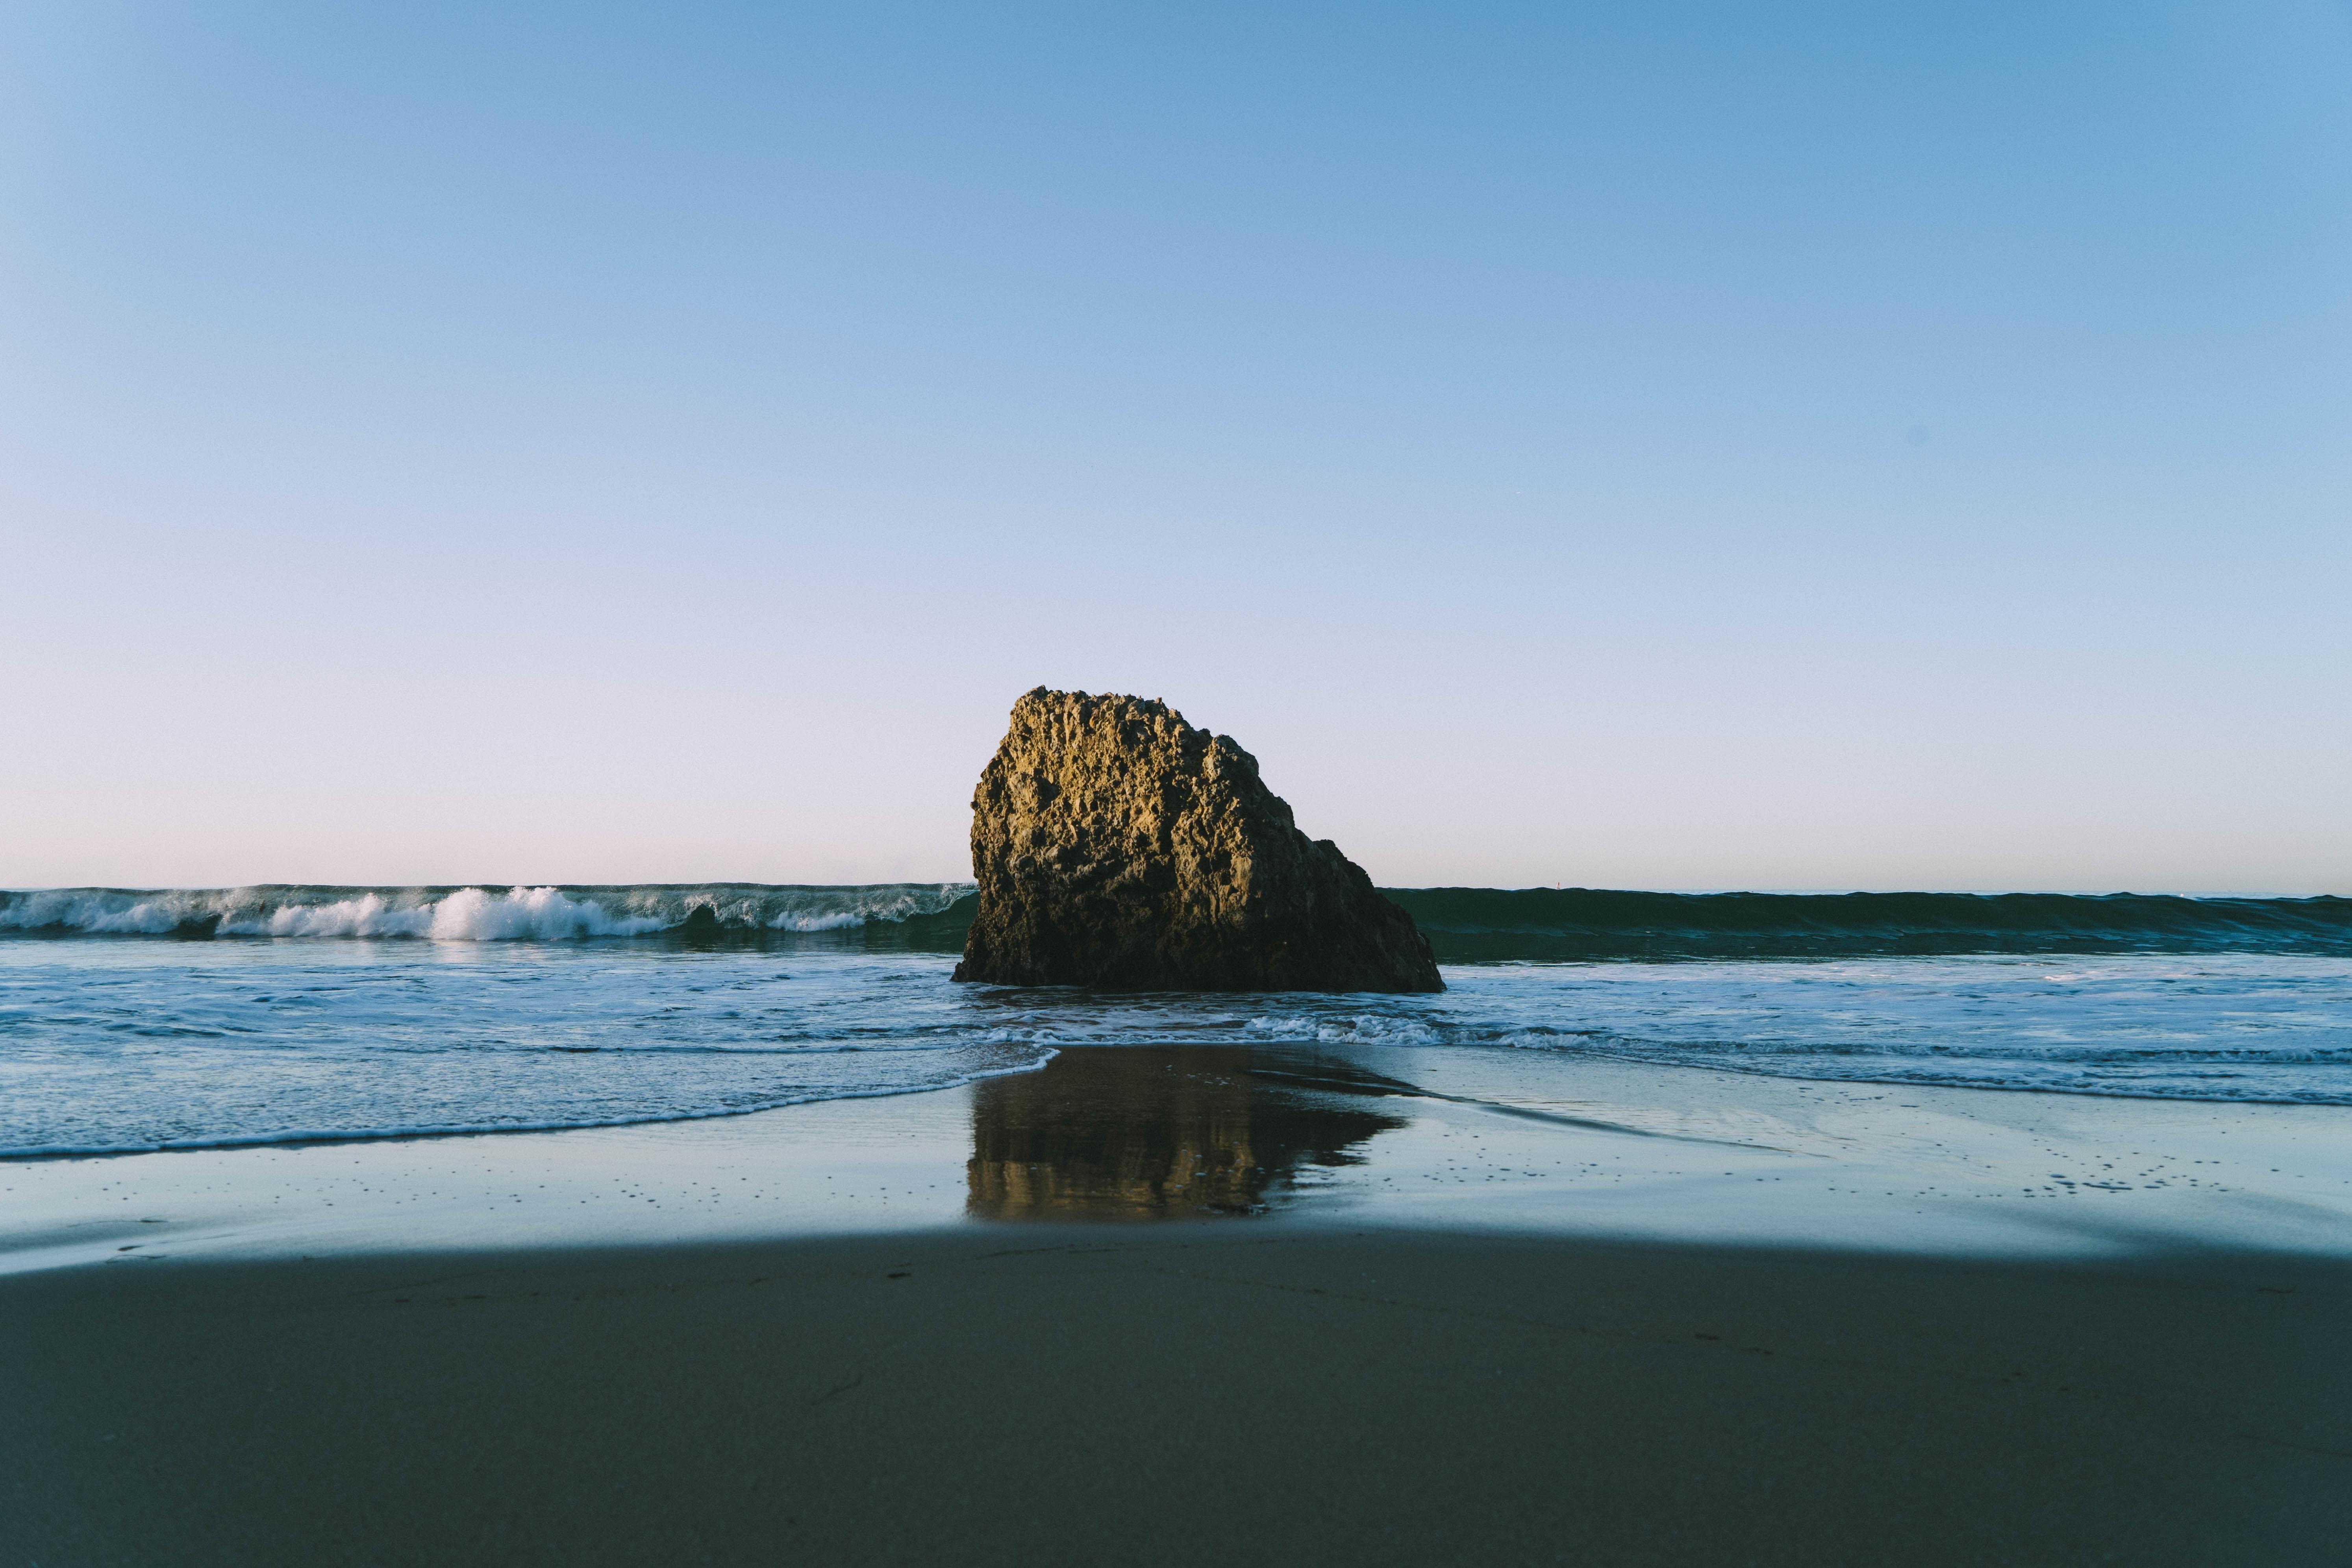 Sunrise at Corona del Mar State Beach in California.